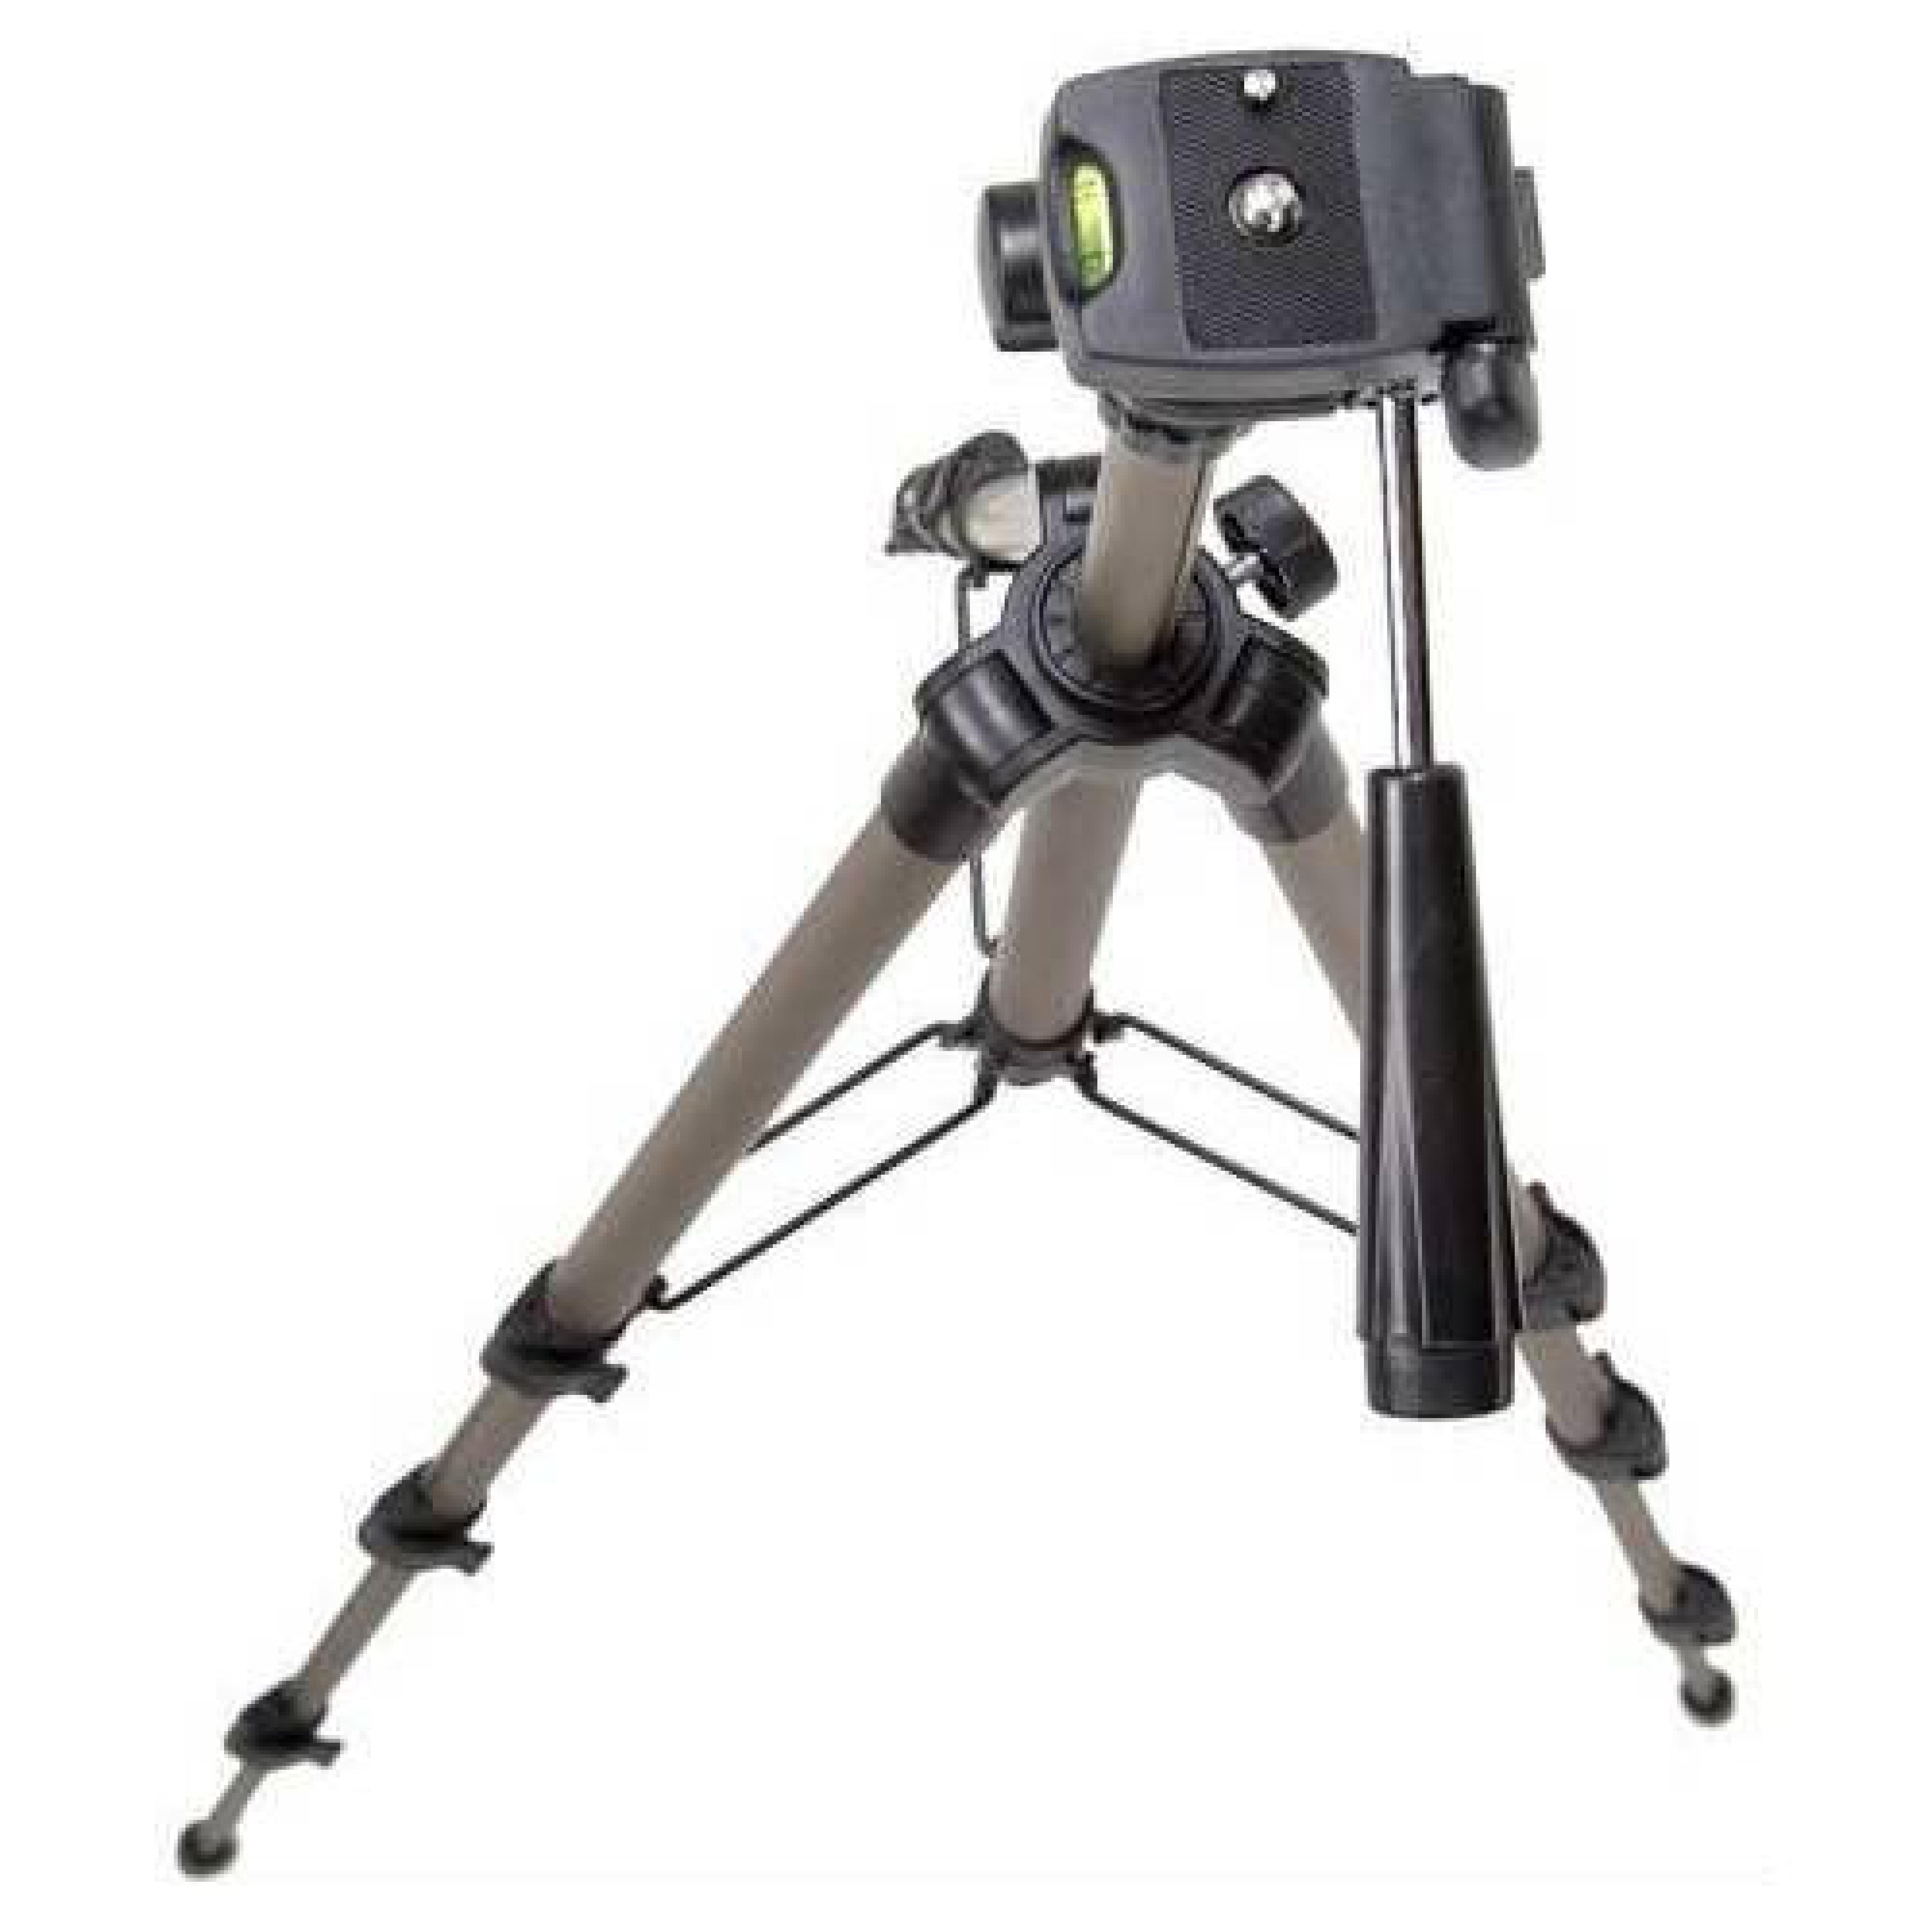 105cm-tripod-fotograf-makinesi-kamera-cep-telefonu-ayakli-cantali